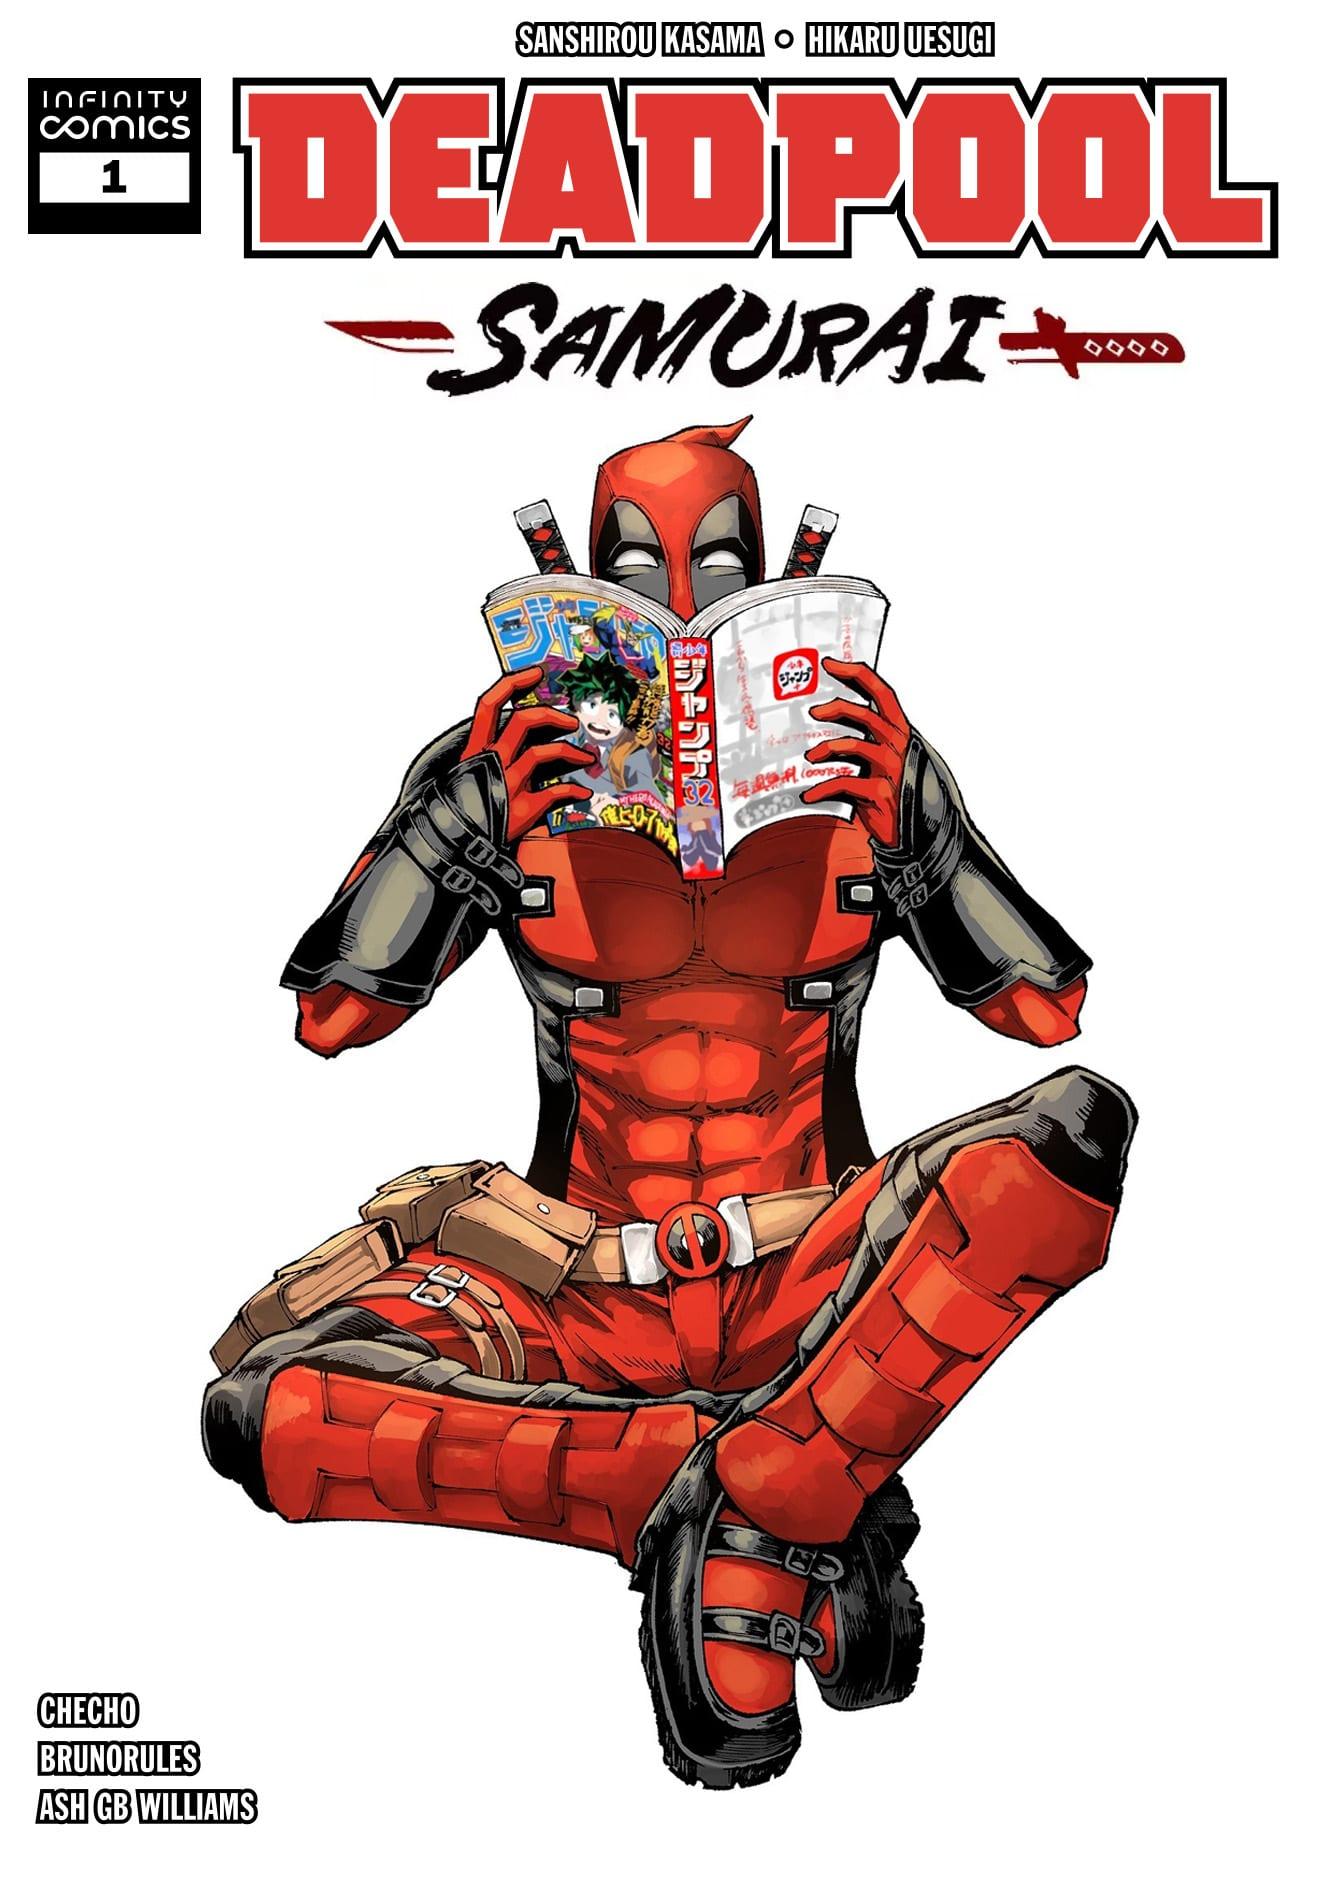 Manga completo Deadpool: Samurai